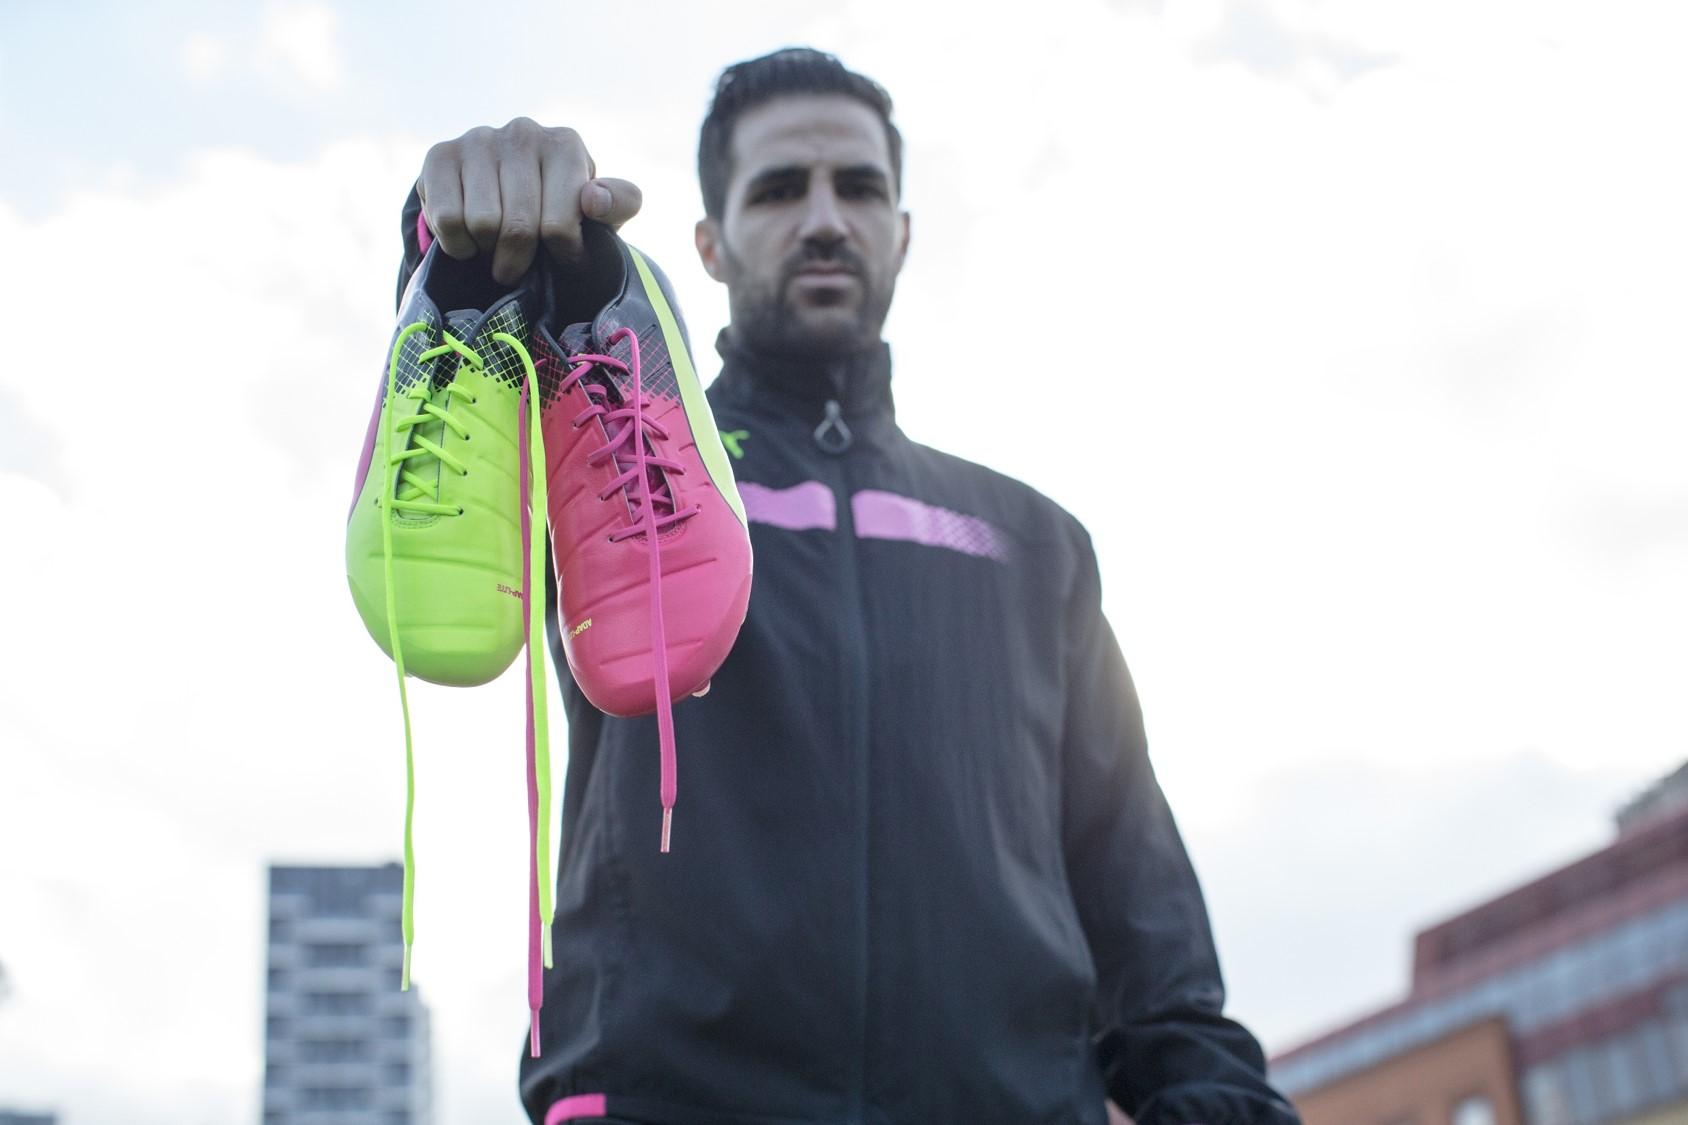 cesc fabregas chaussures jaune rose PUMA Football_Tricks evopower 2016